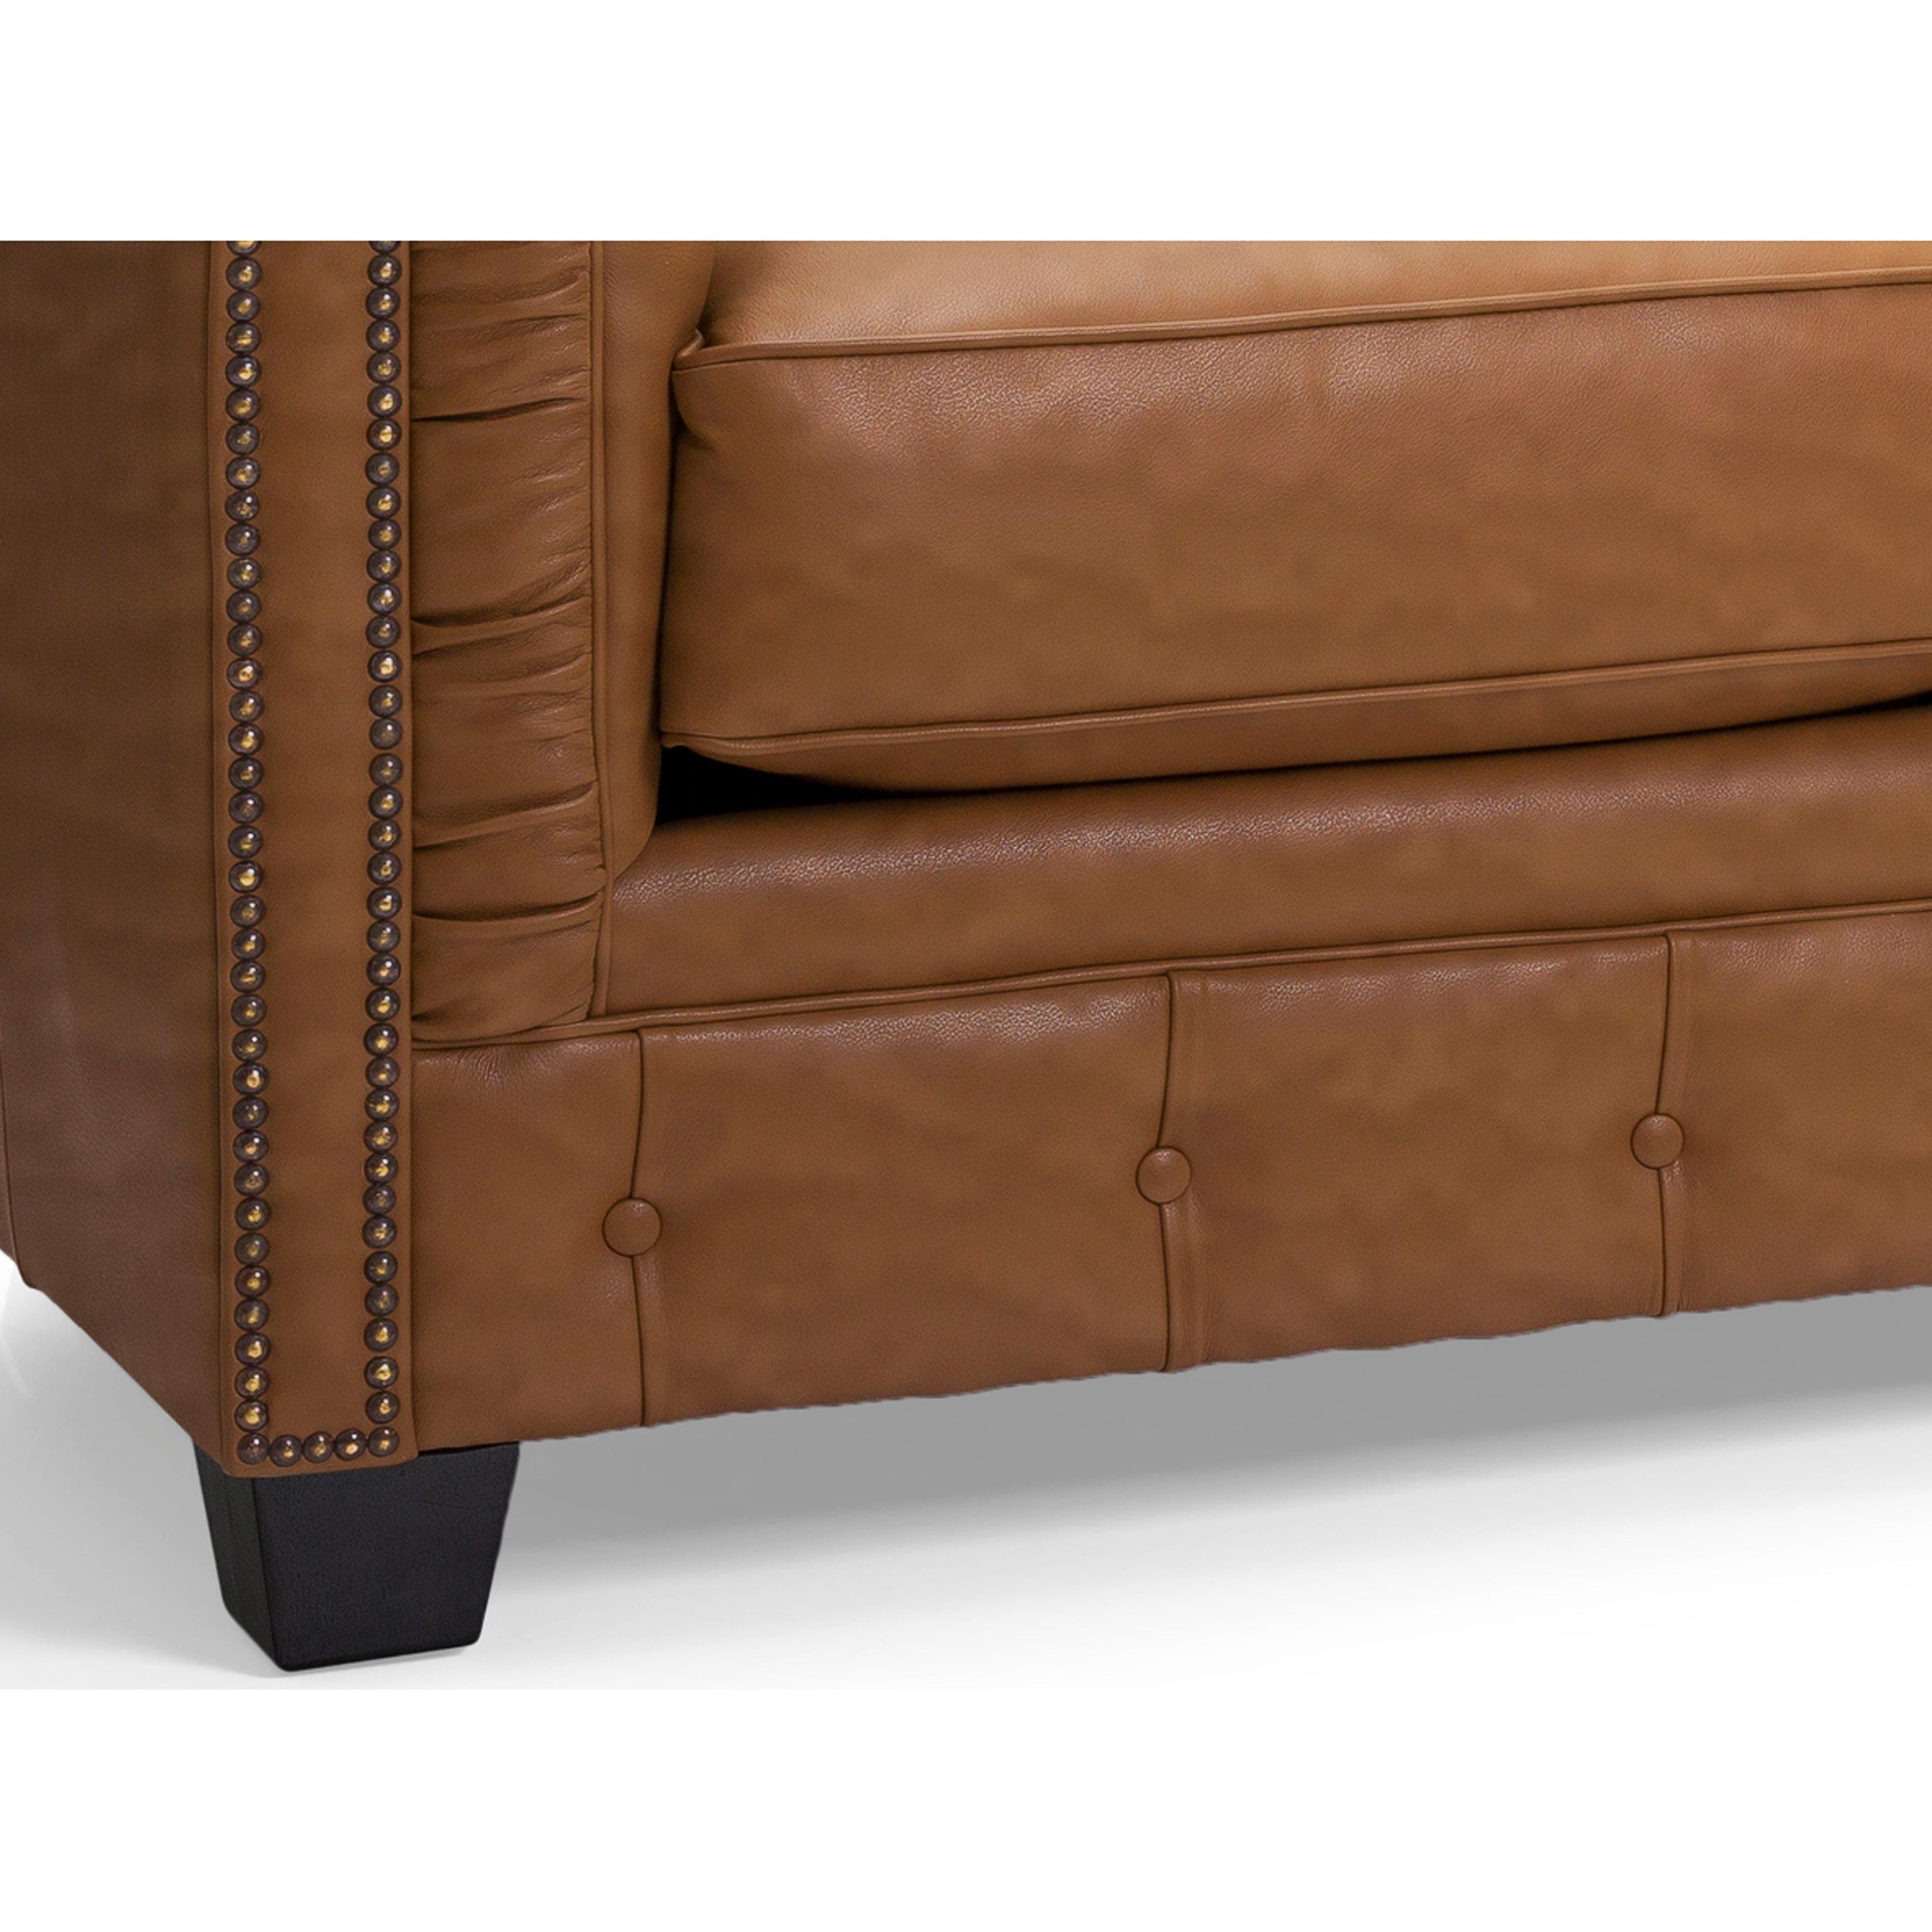 Shop Hancock Tufted Top Grain Italian Leather Chesterfield Sofa On